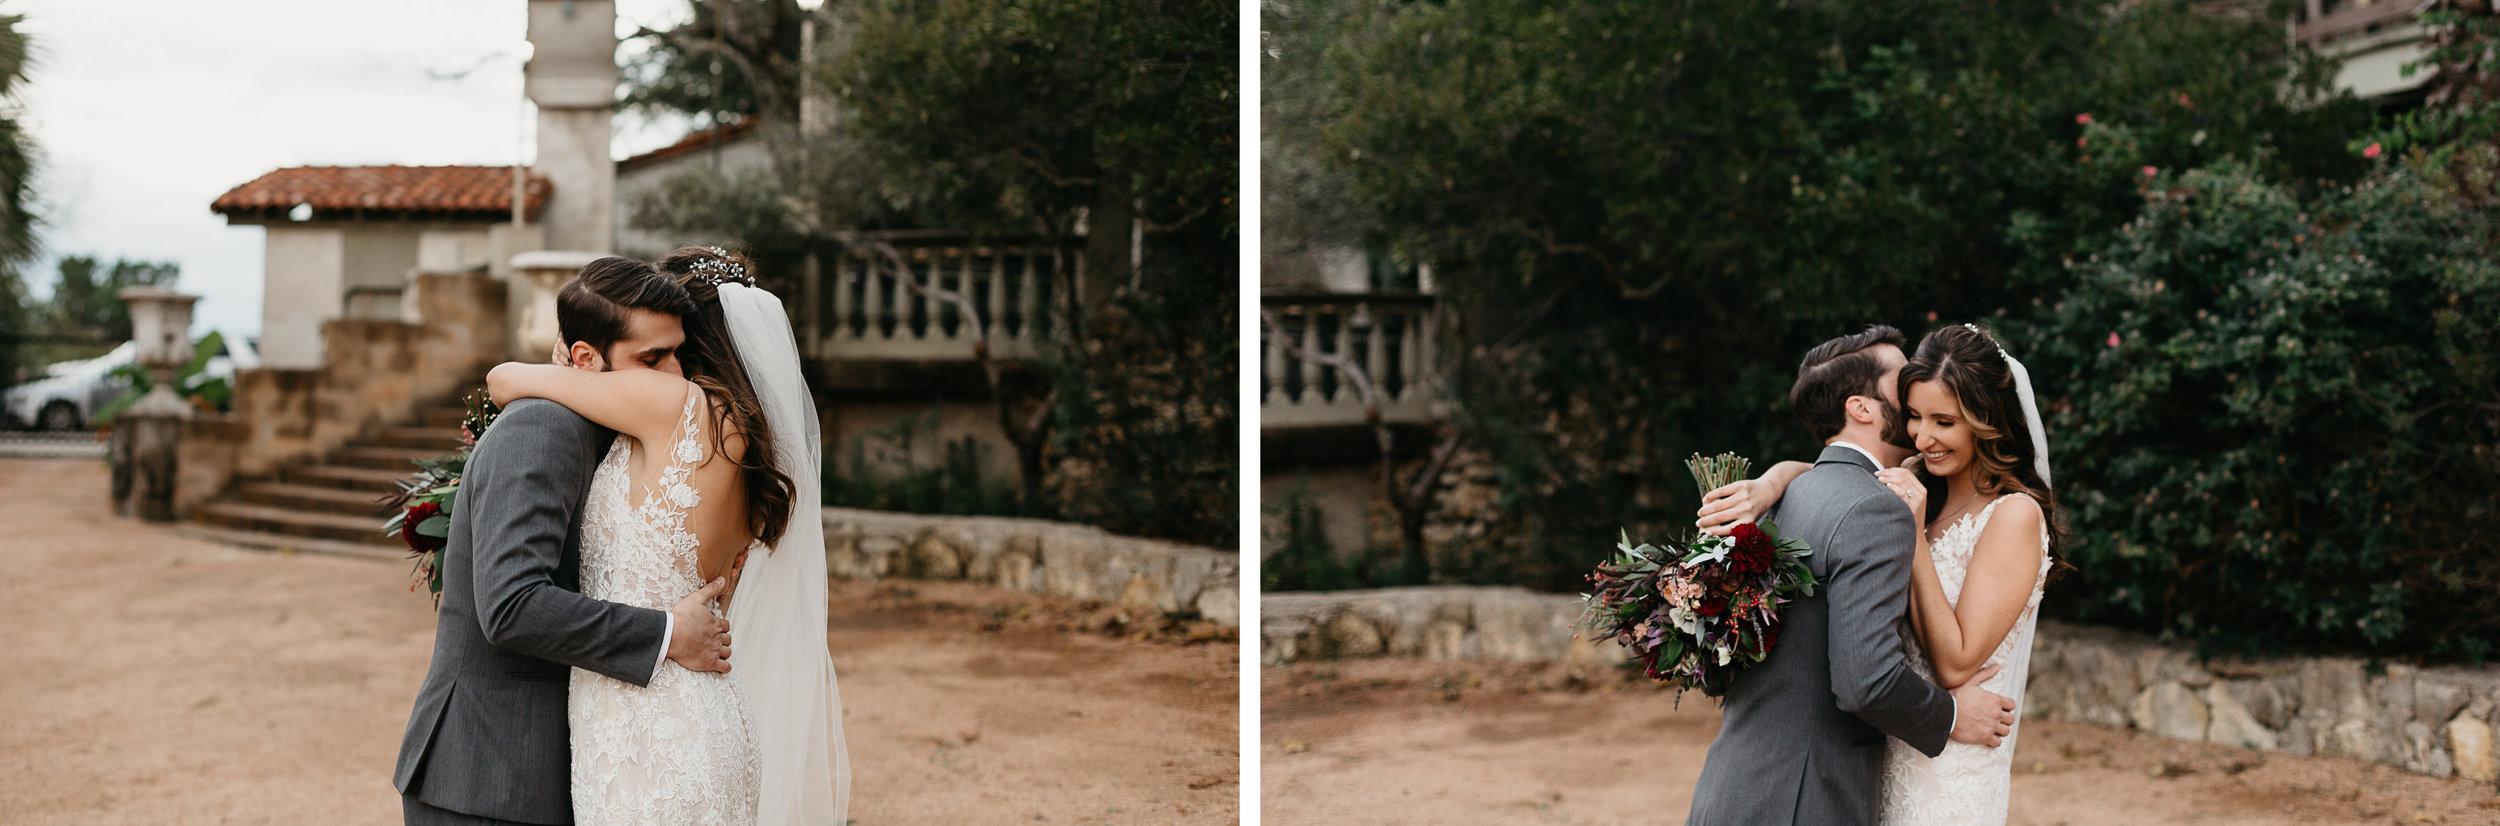 austin texas wedding photogapher elopement photographer villa antonia austin 21.jpg